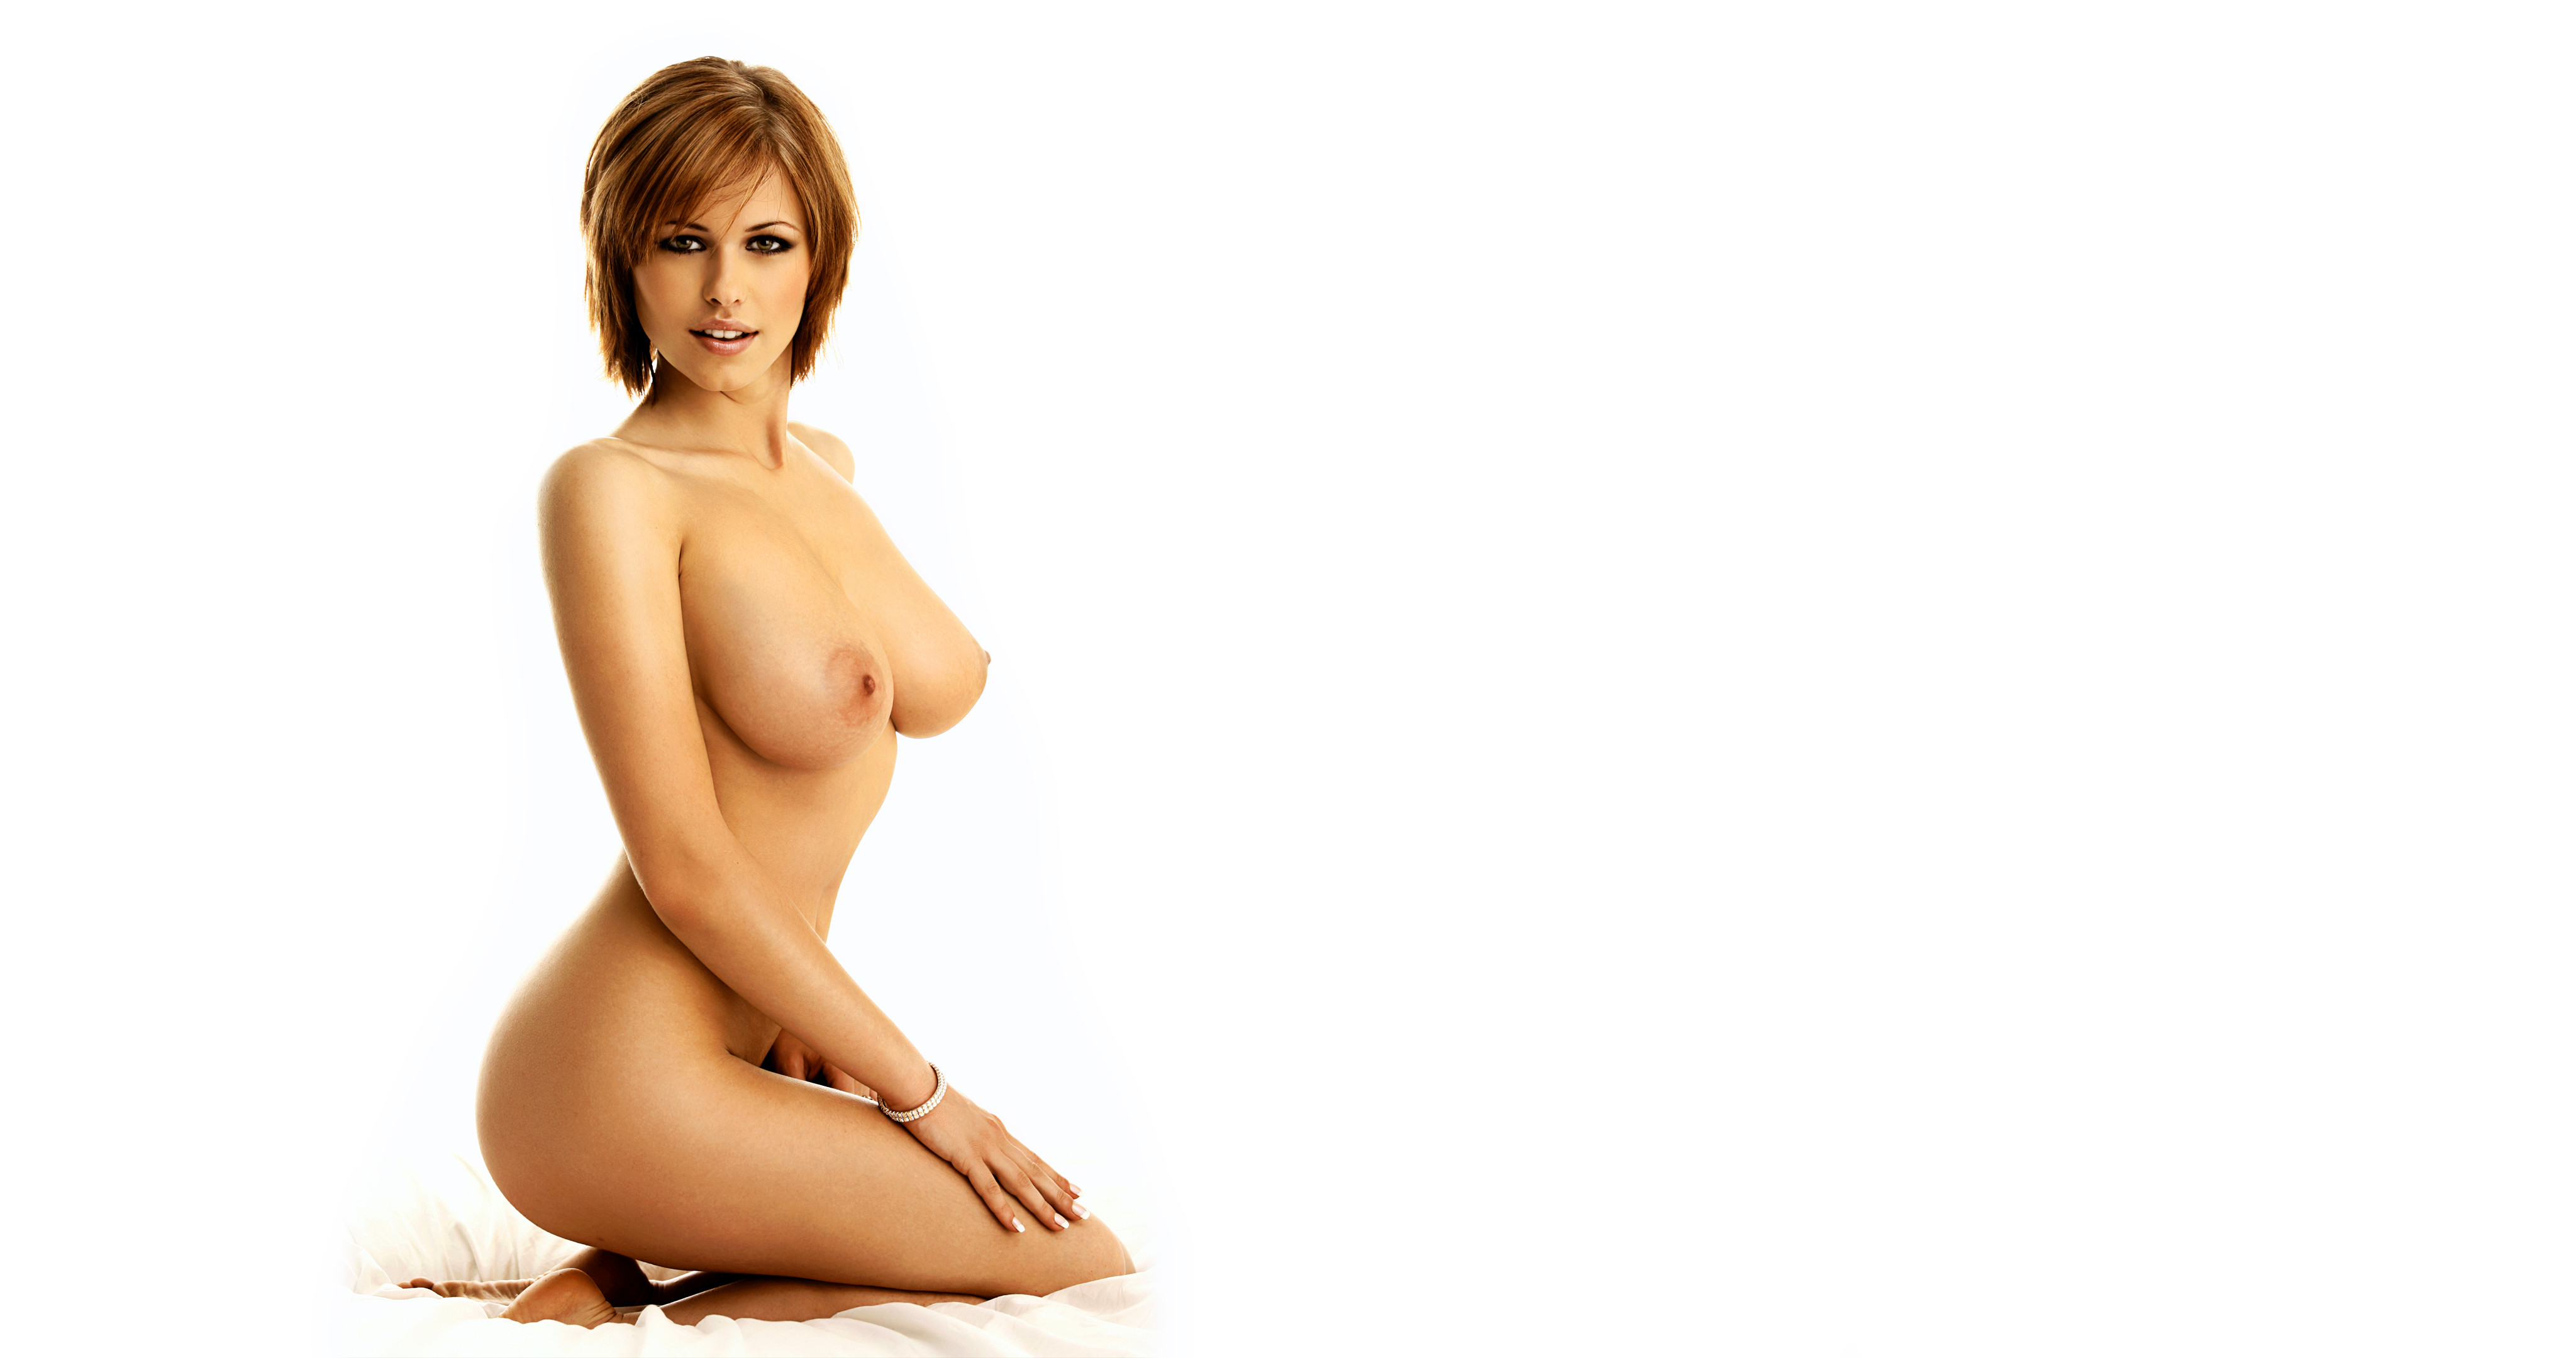 Big tits hd porno